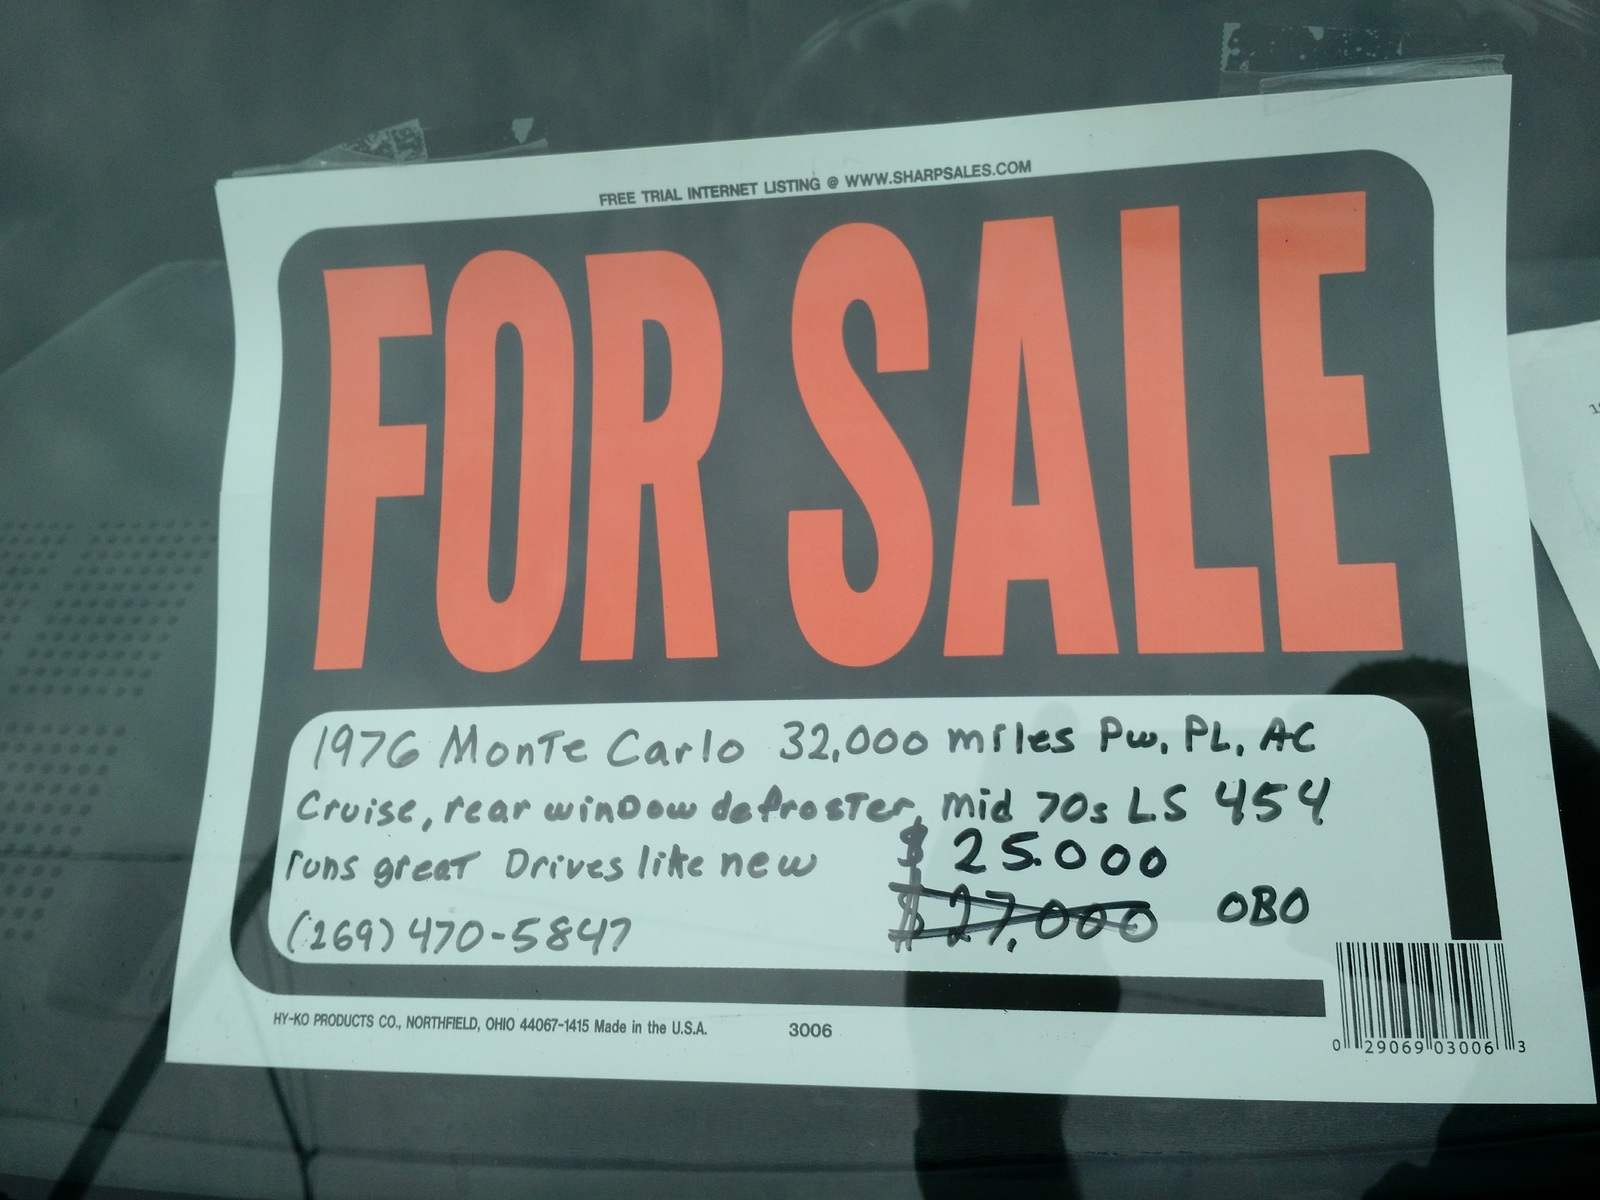 Как американцы продают свои автомобили. 1976 Chevrolet Monte Carlo, $25,000